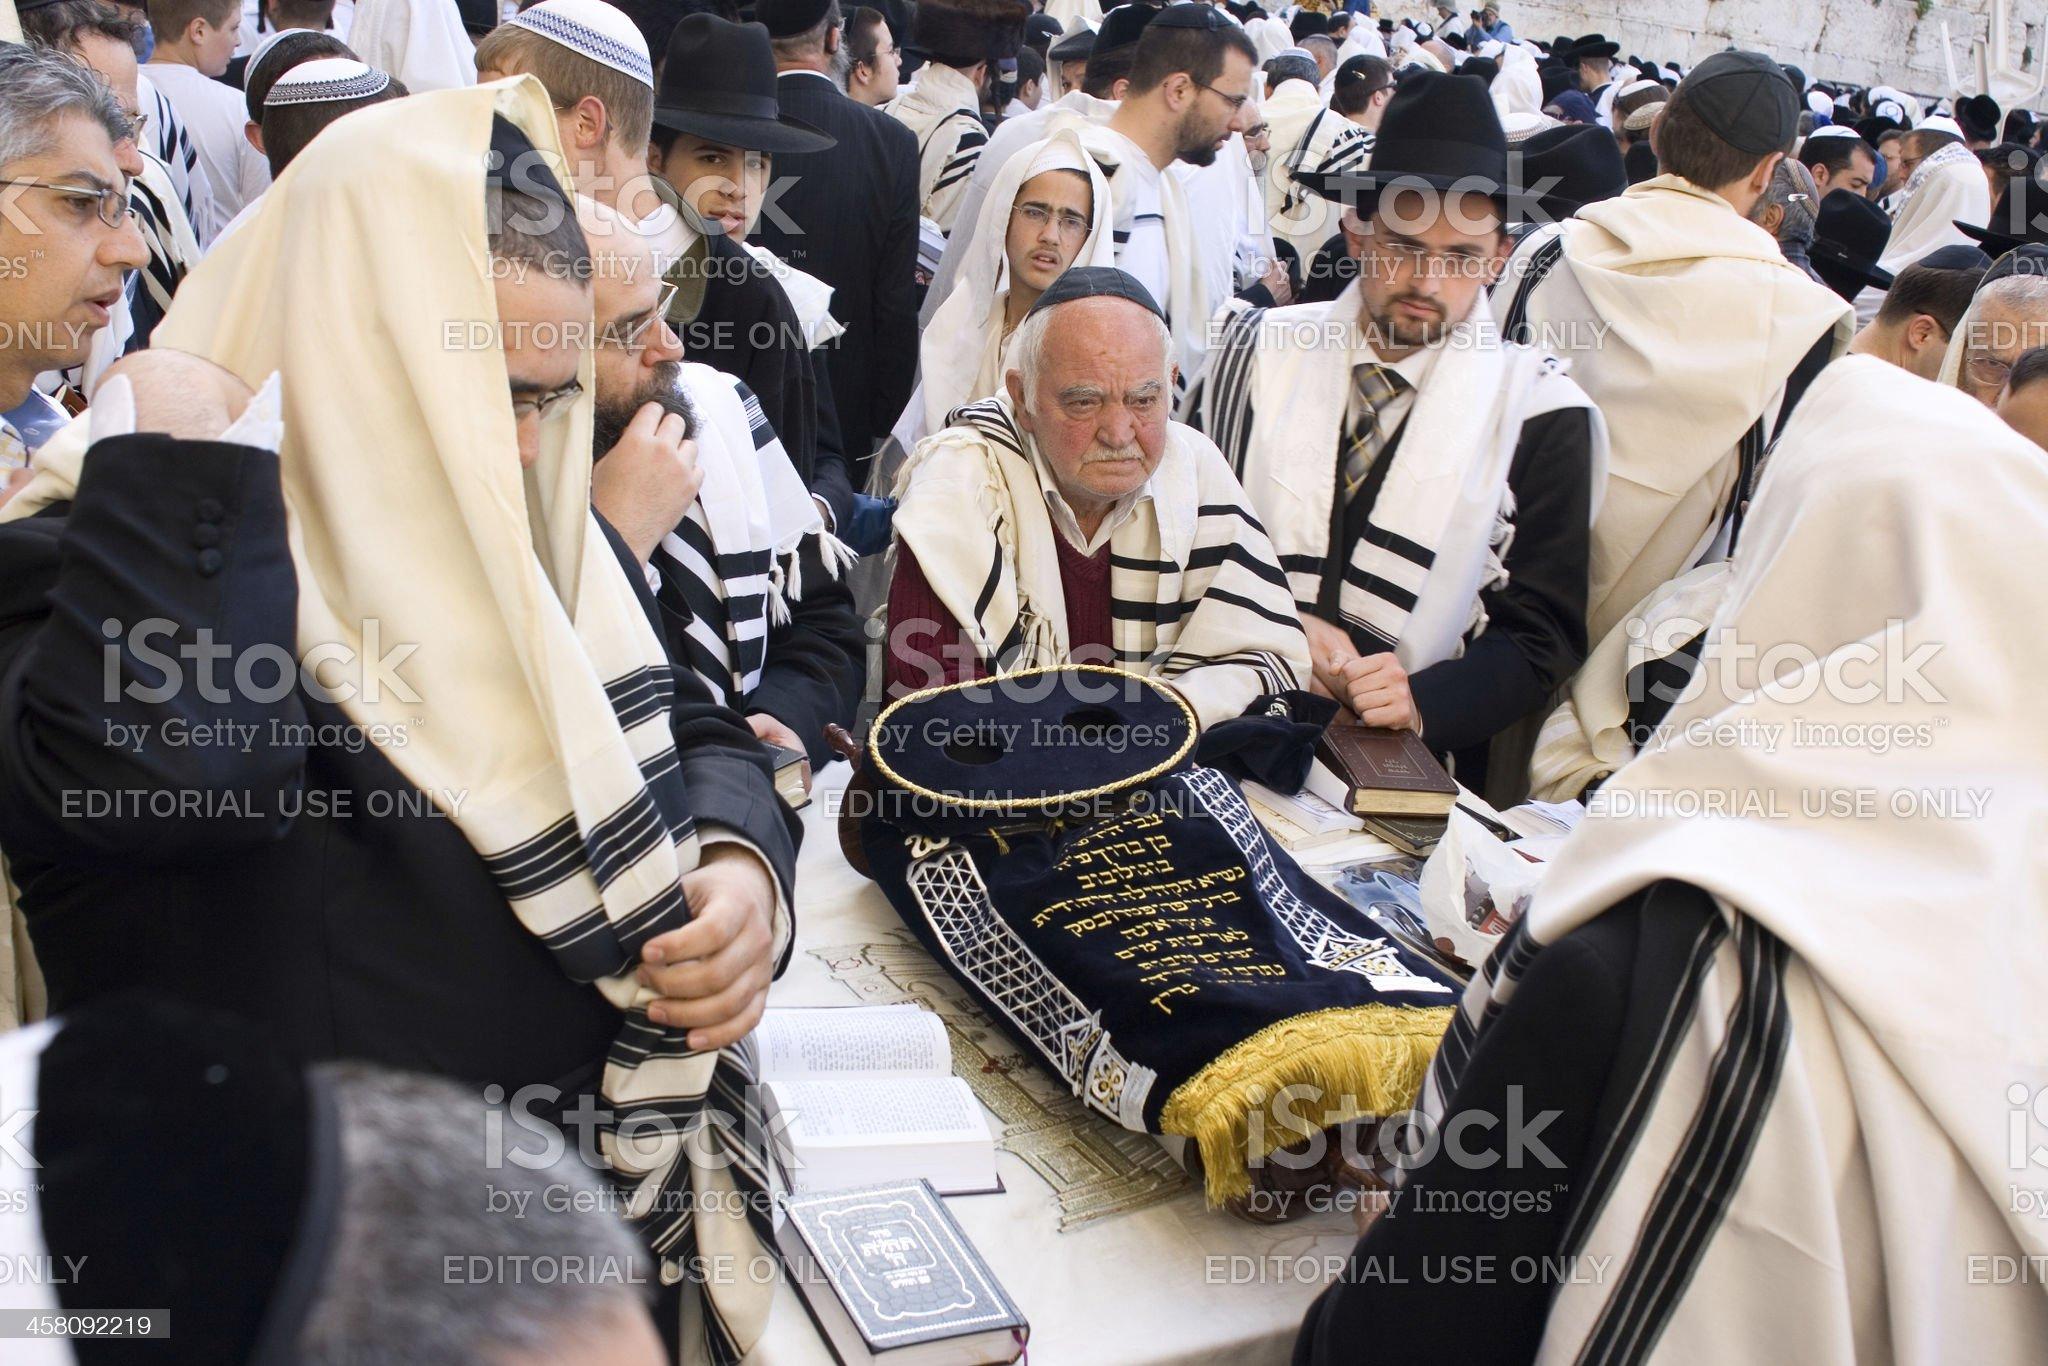 Celebration of Passover near the Wailing Wall royalty-free stock photo